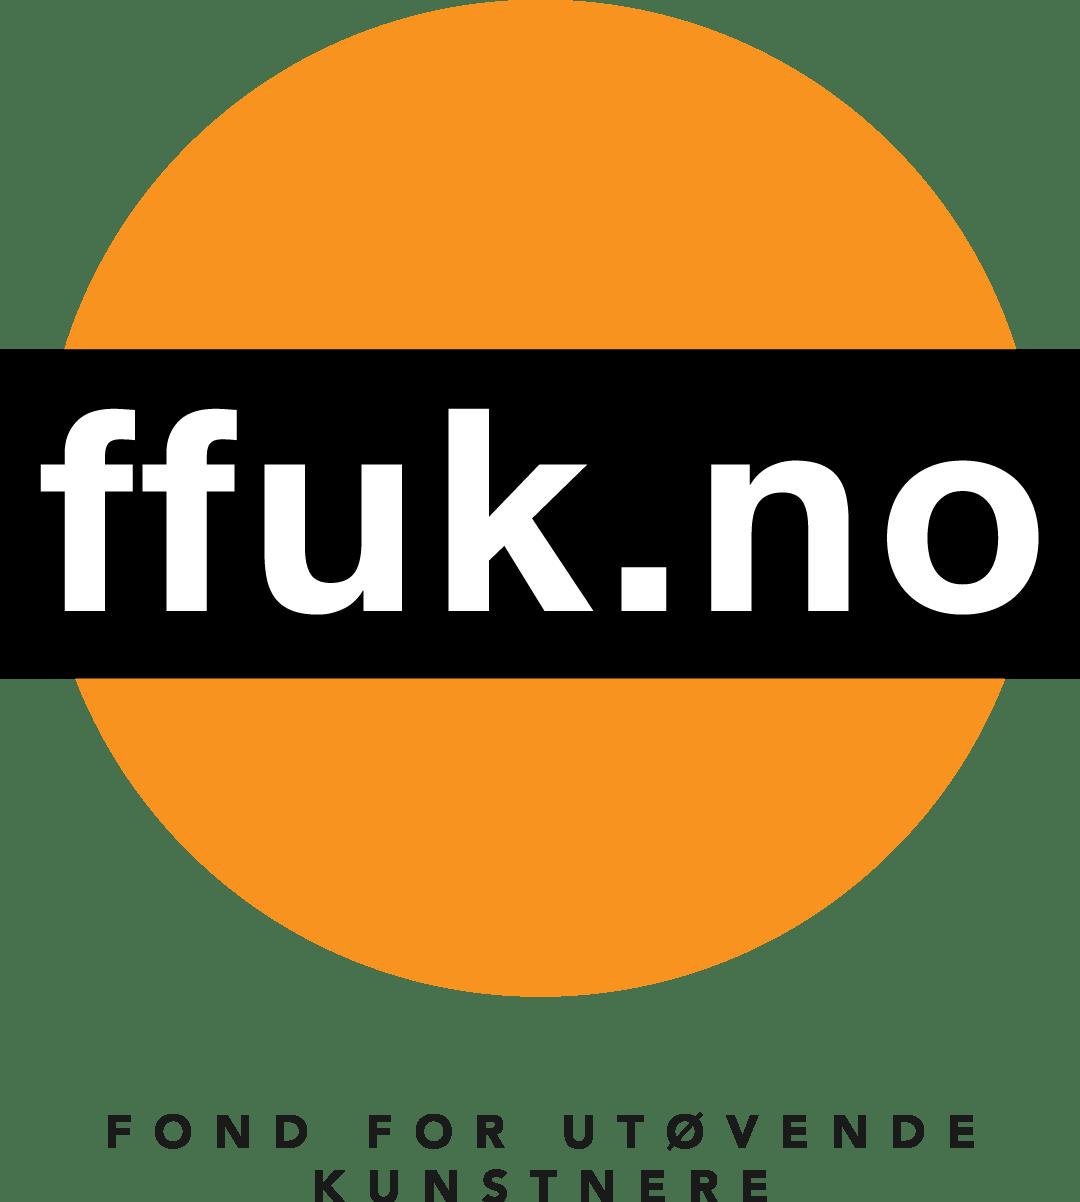 NyFFUK-logo-png-transparent